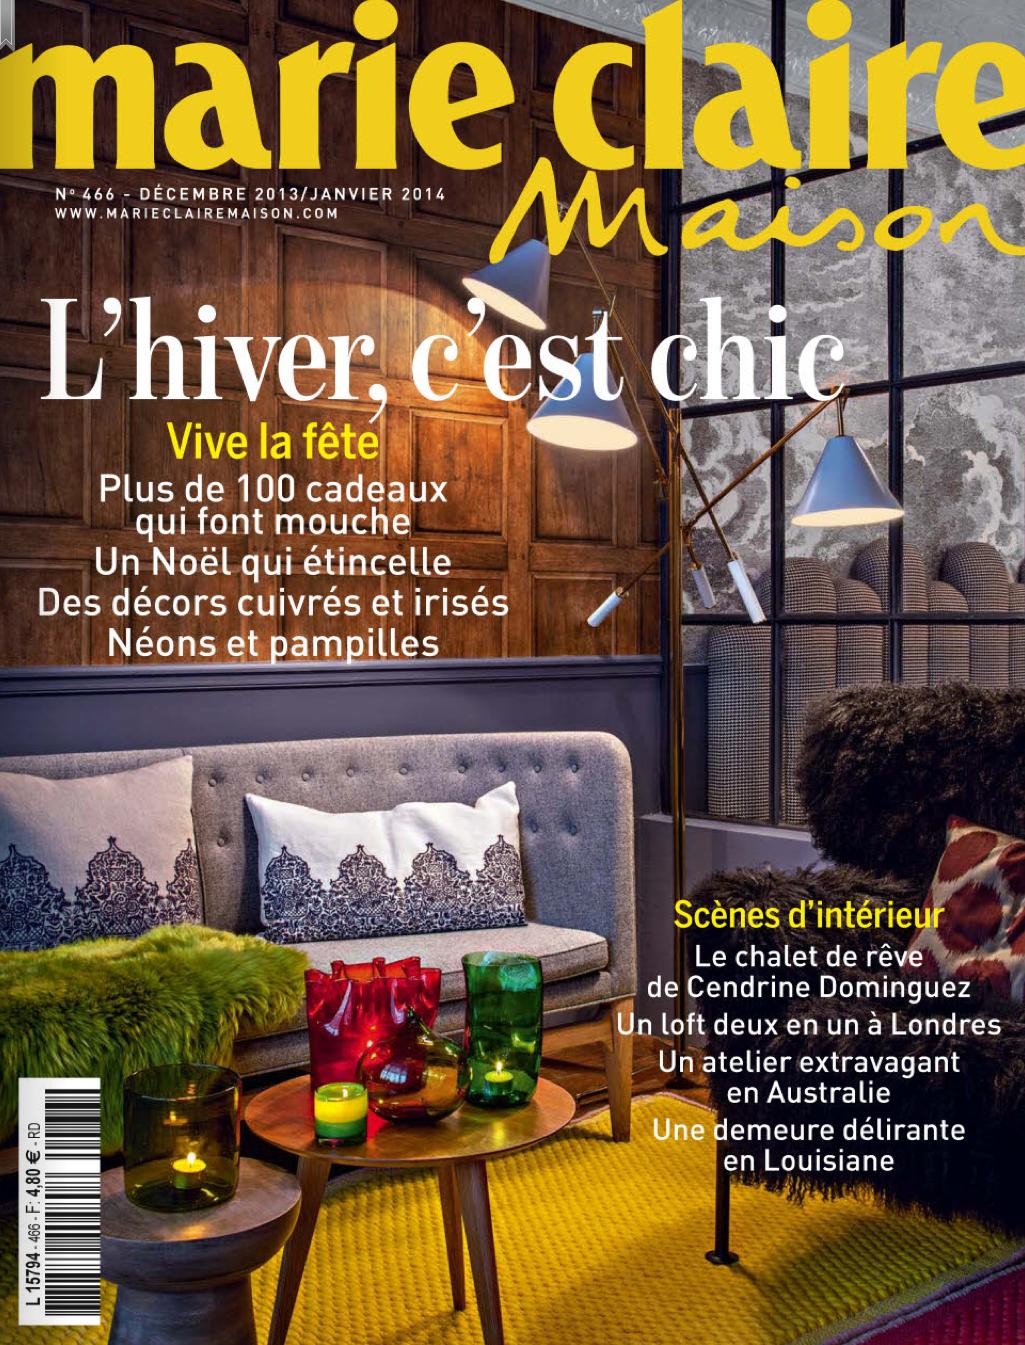 2013-Dec2013-Jan2014-Marie Claire-cover.png